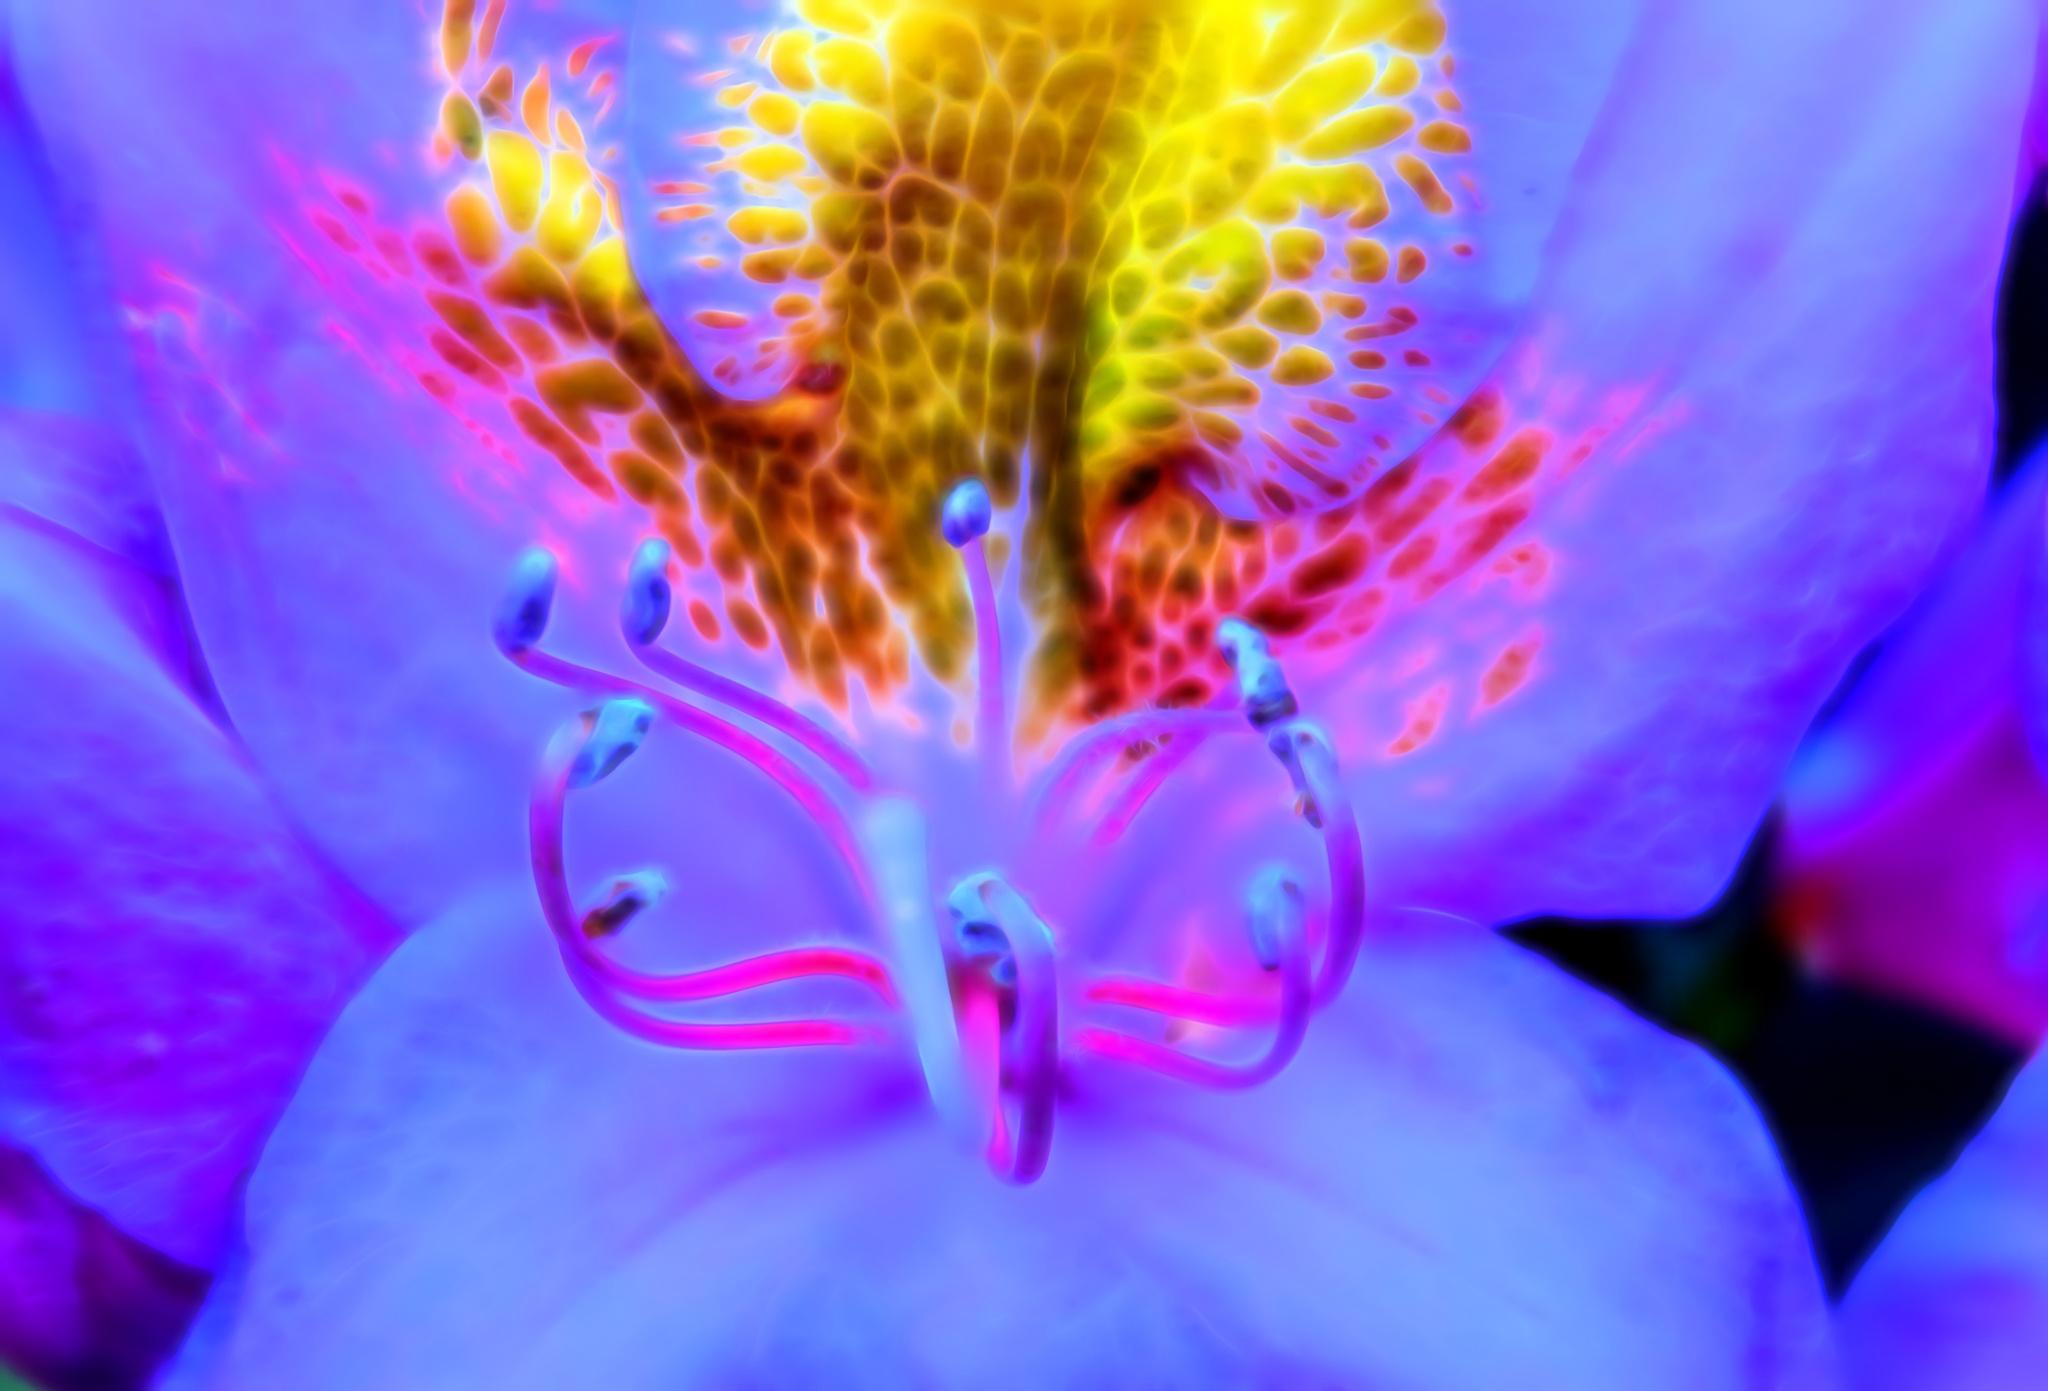 Electric Flower by lbartman55